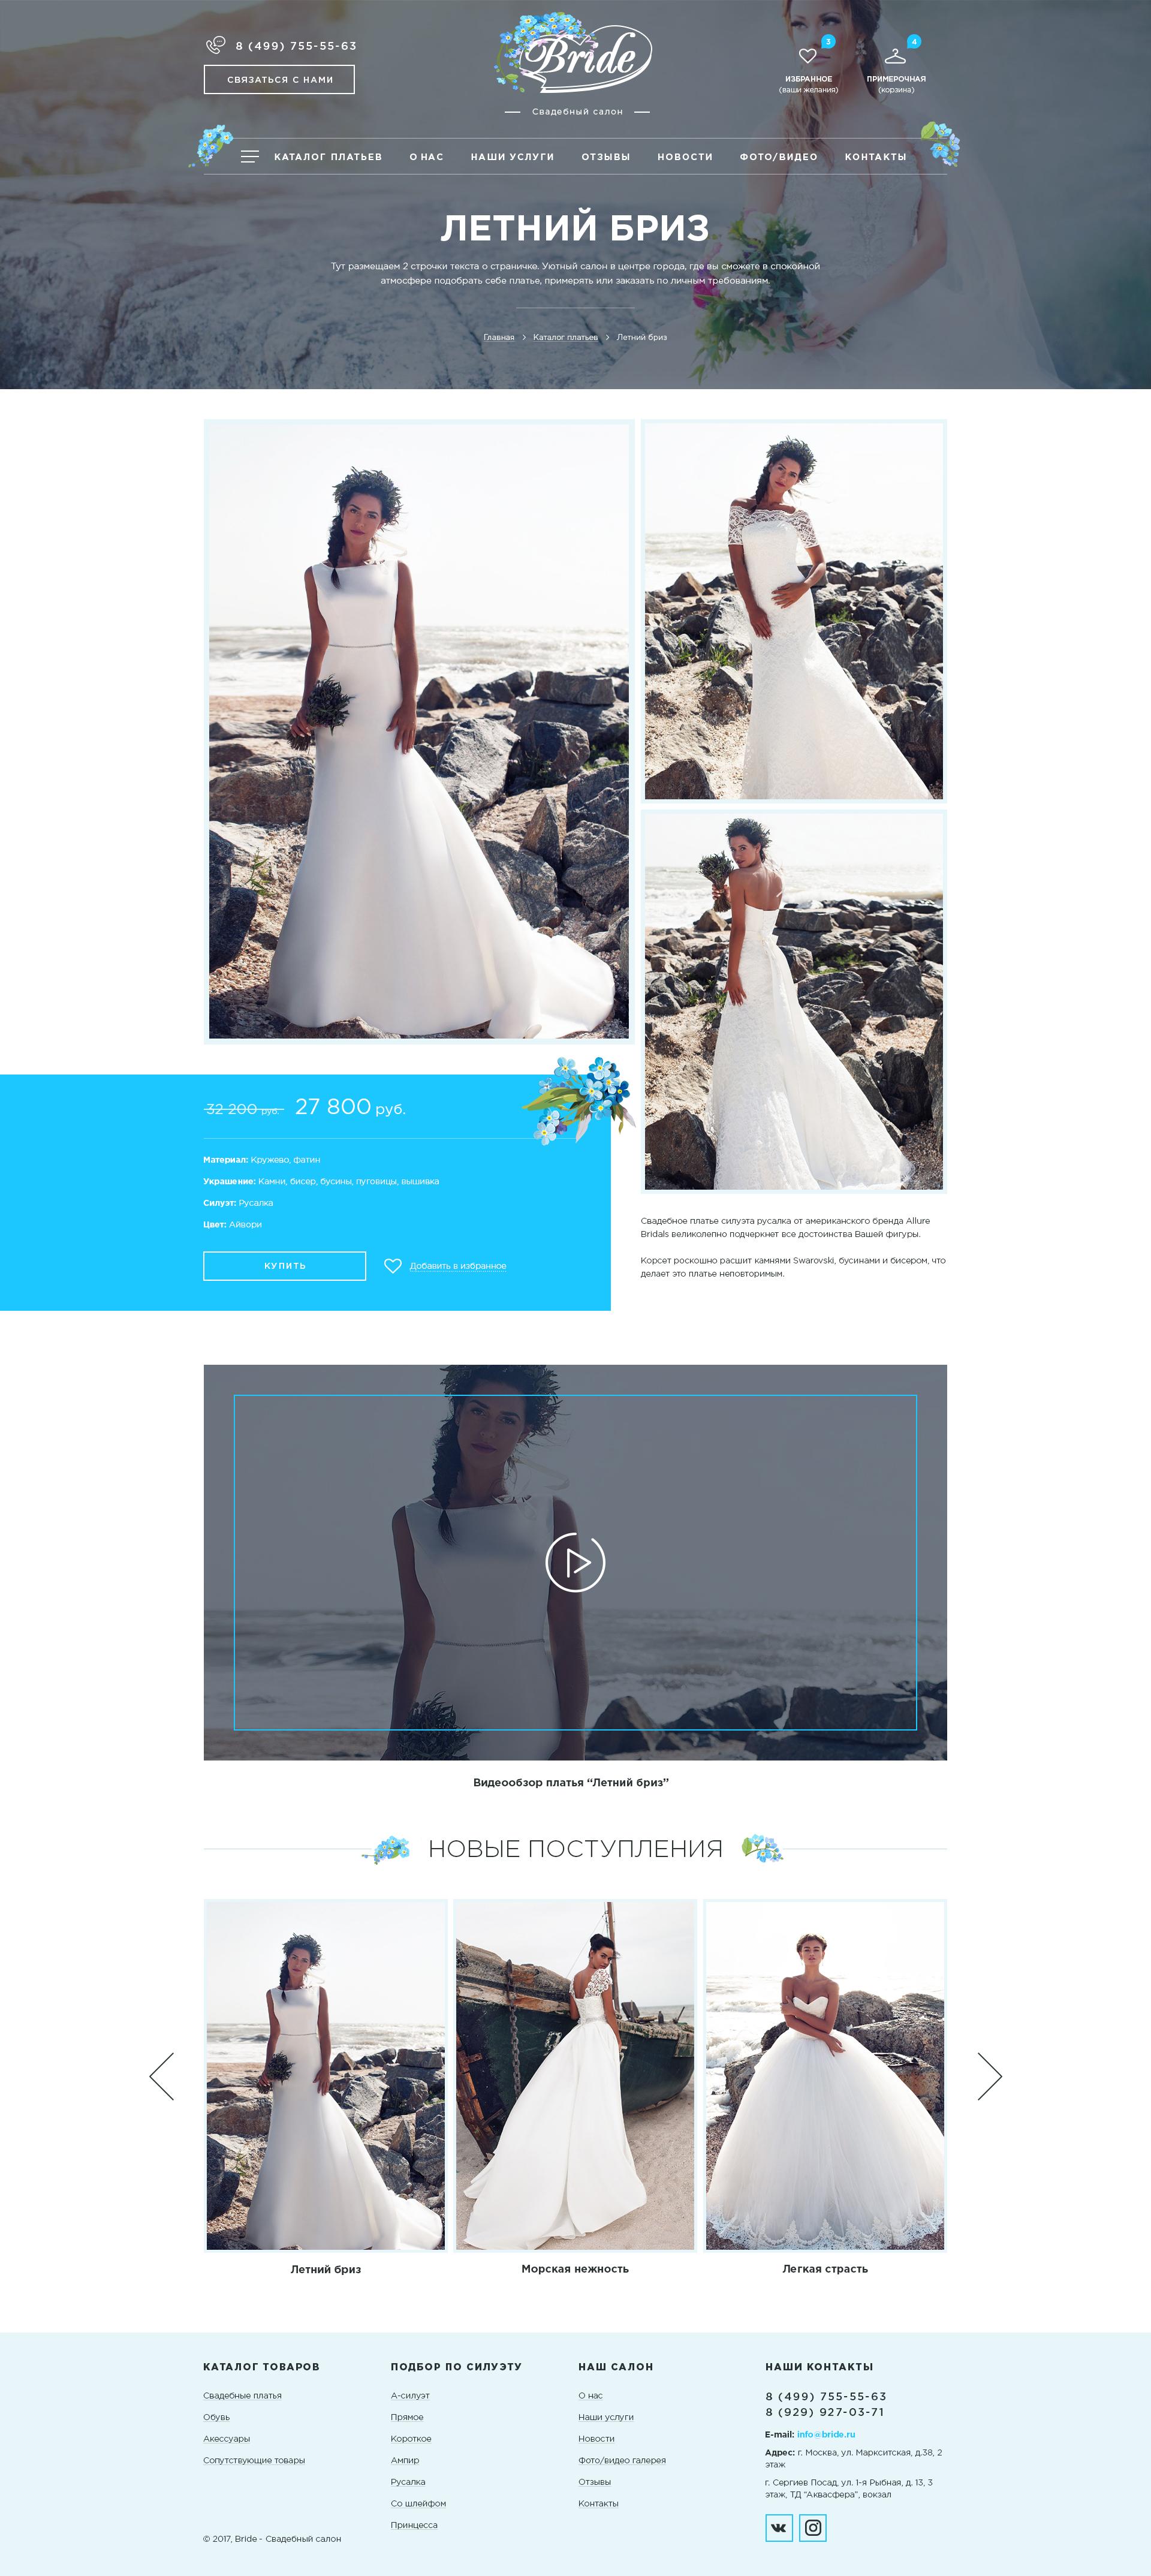 Bride_kartochka2